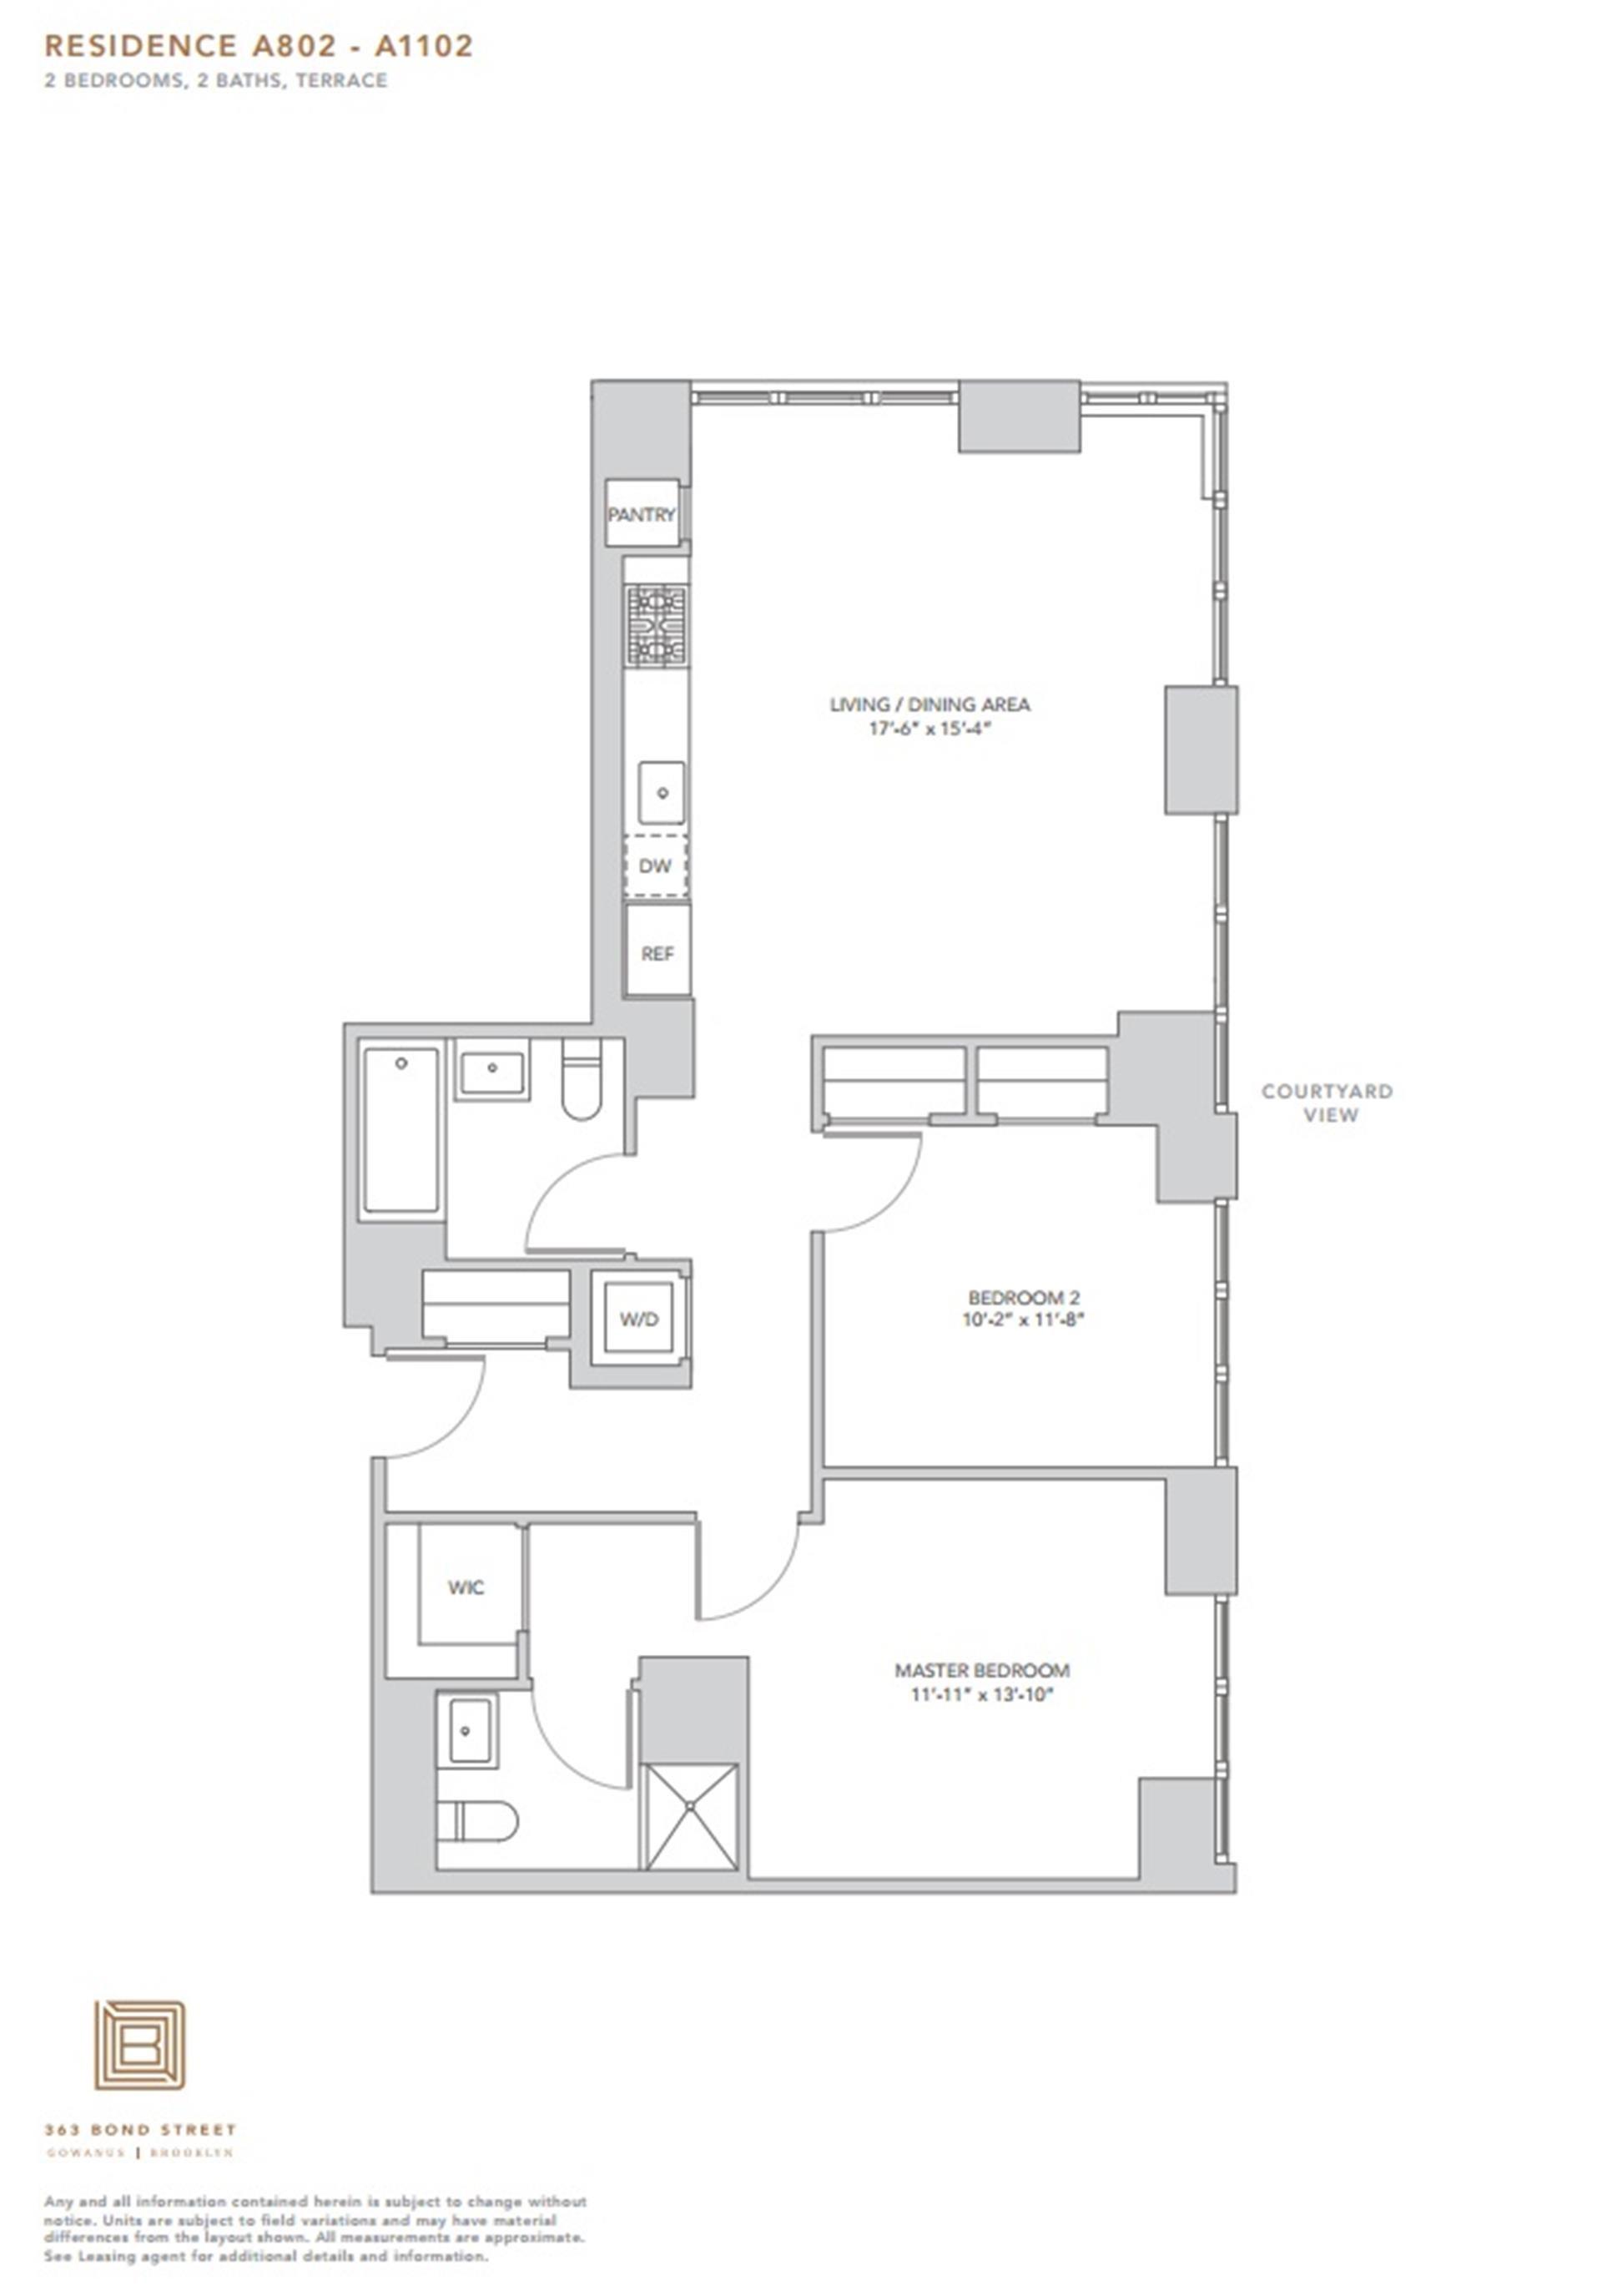 363 Bond Street, Gowanus, Brooklyn, NY - Home for Rent - NYTimes com